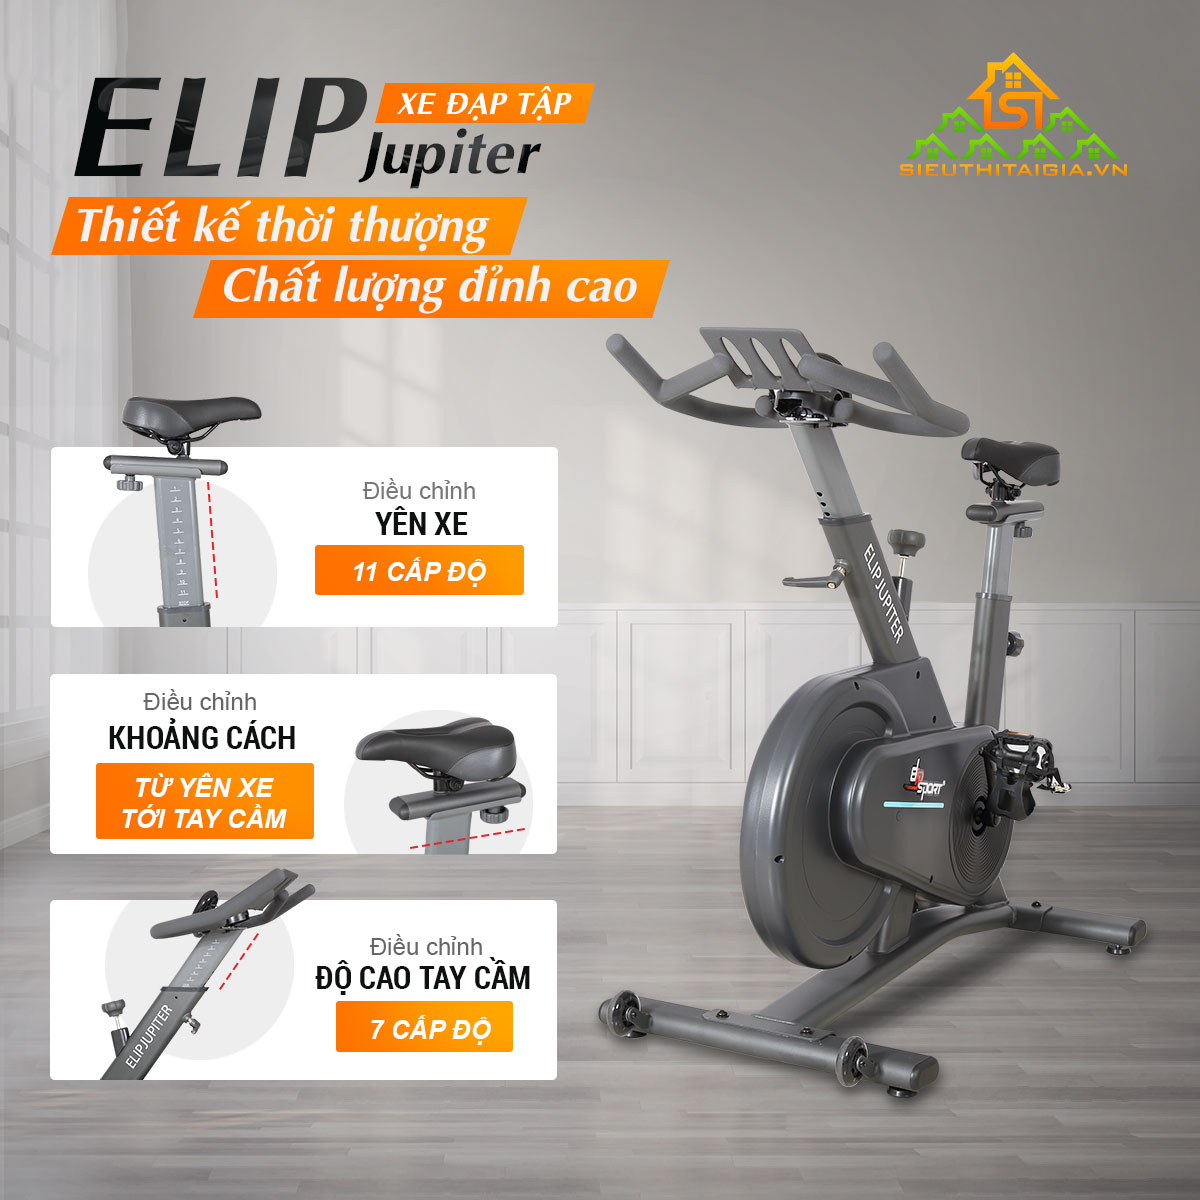 Xe đạp tập ELIP Jupiter